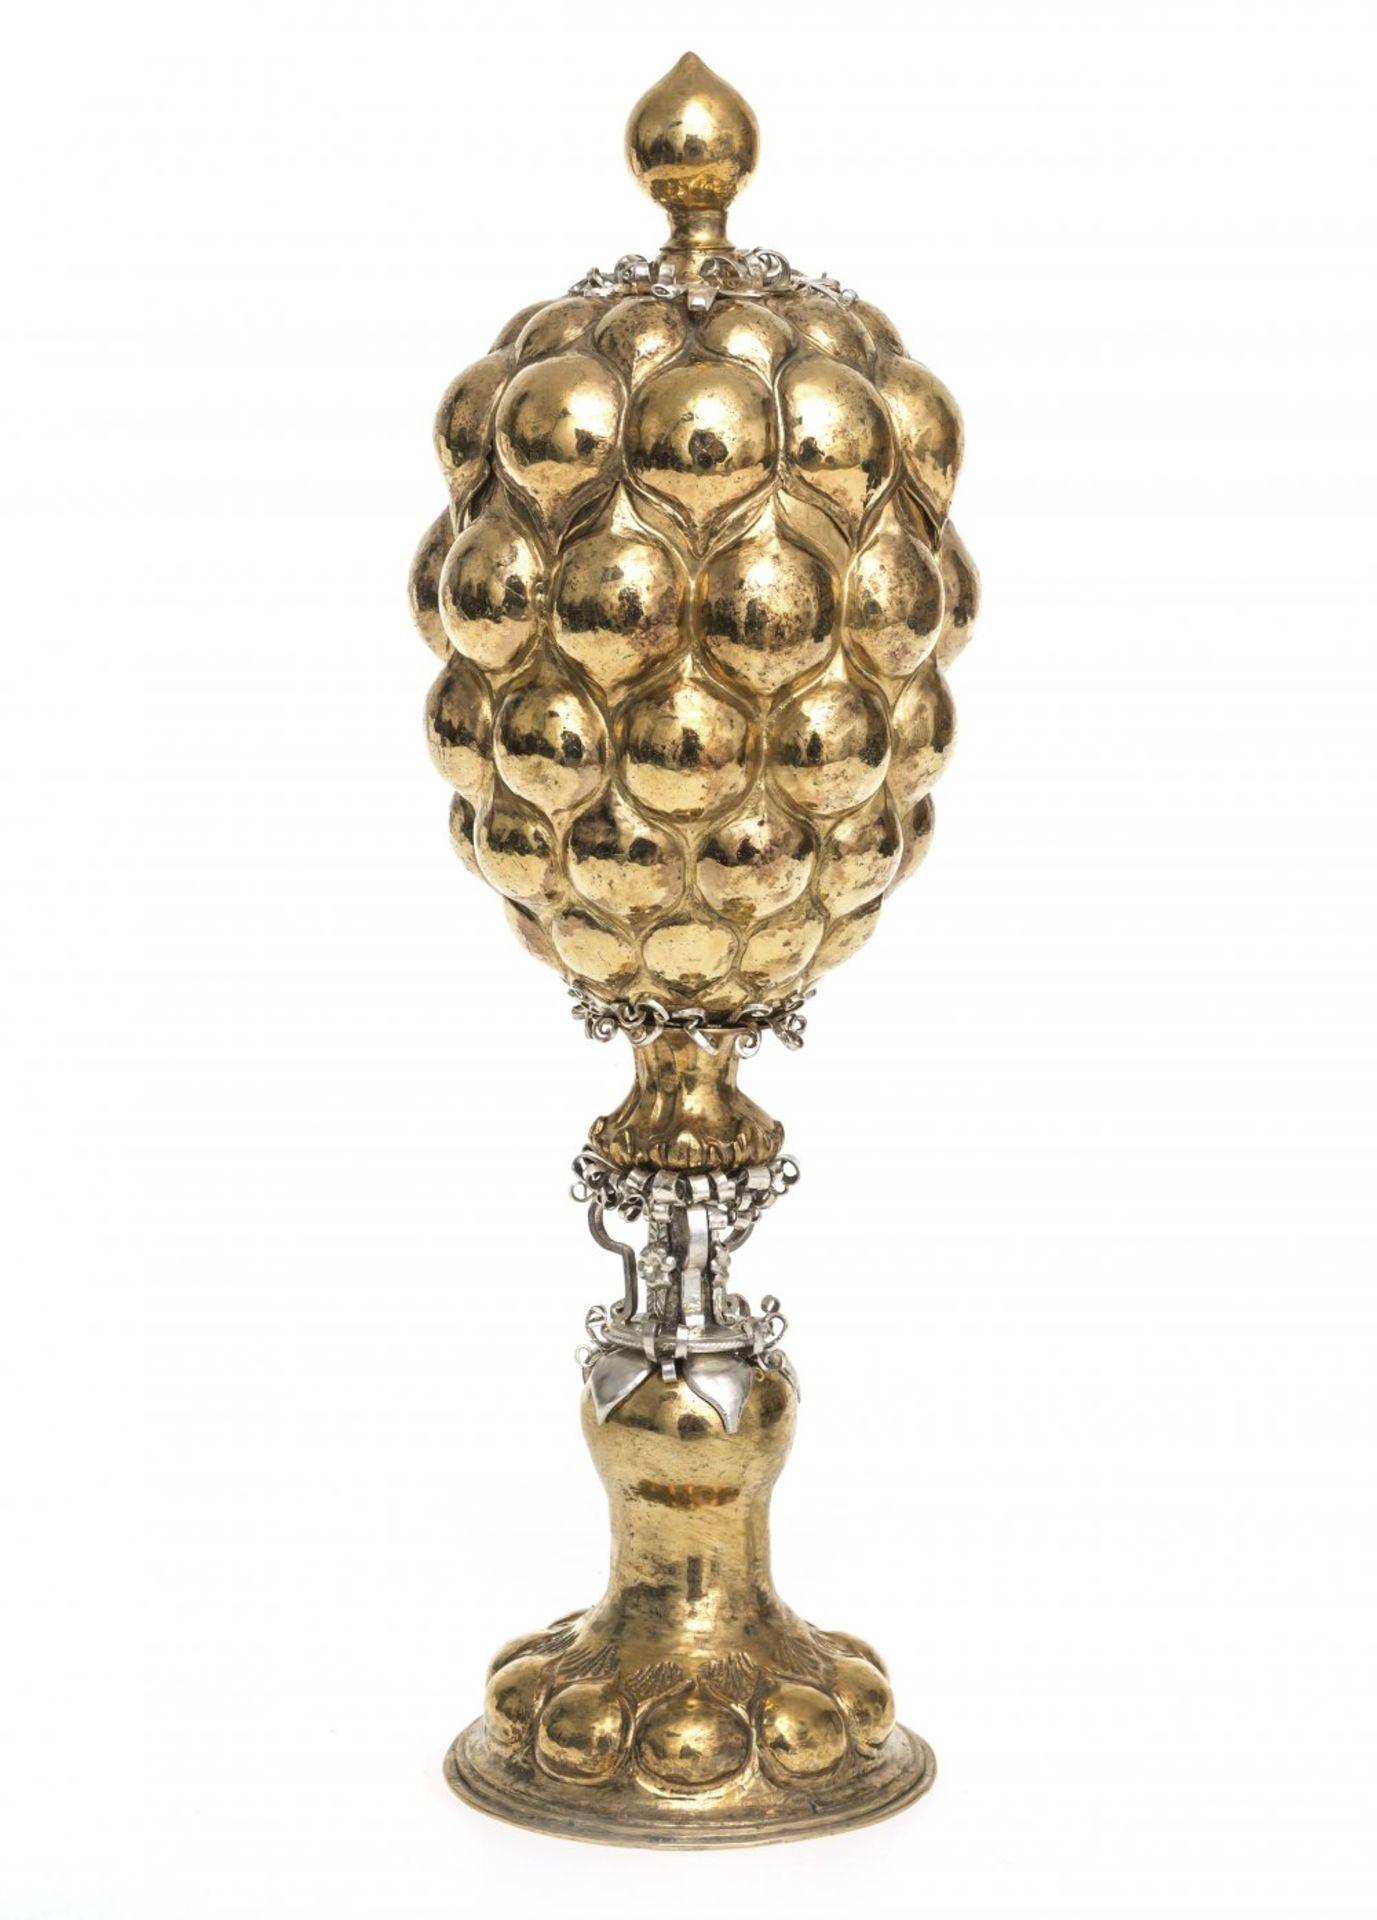 Los 58 - AnanaspokalIm Stil des 17. Jh. Vergoldung erneuert. Ca. 328 g. H. 25 cm.